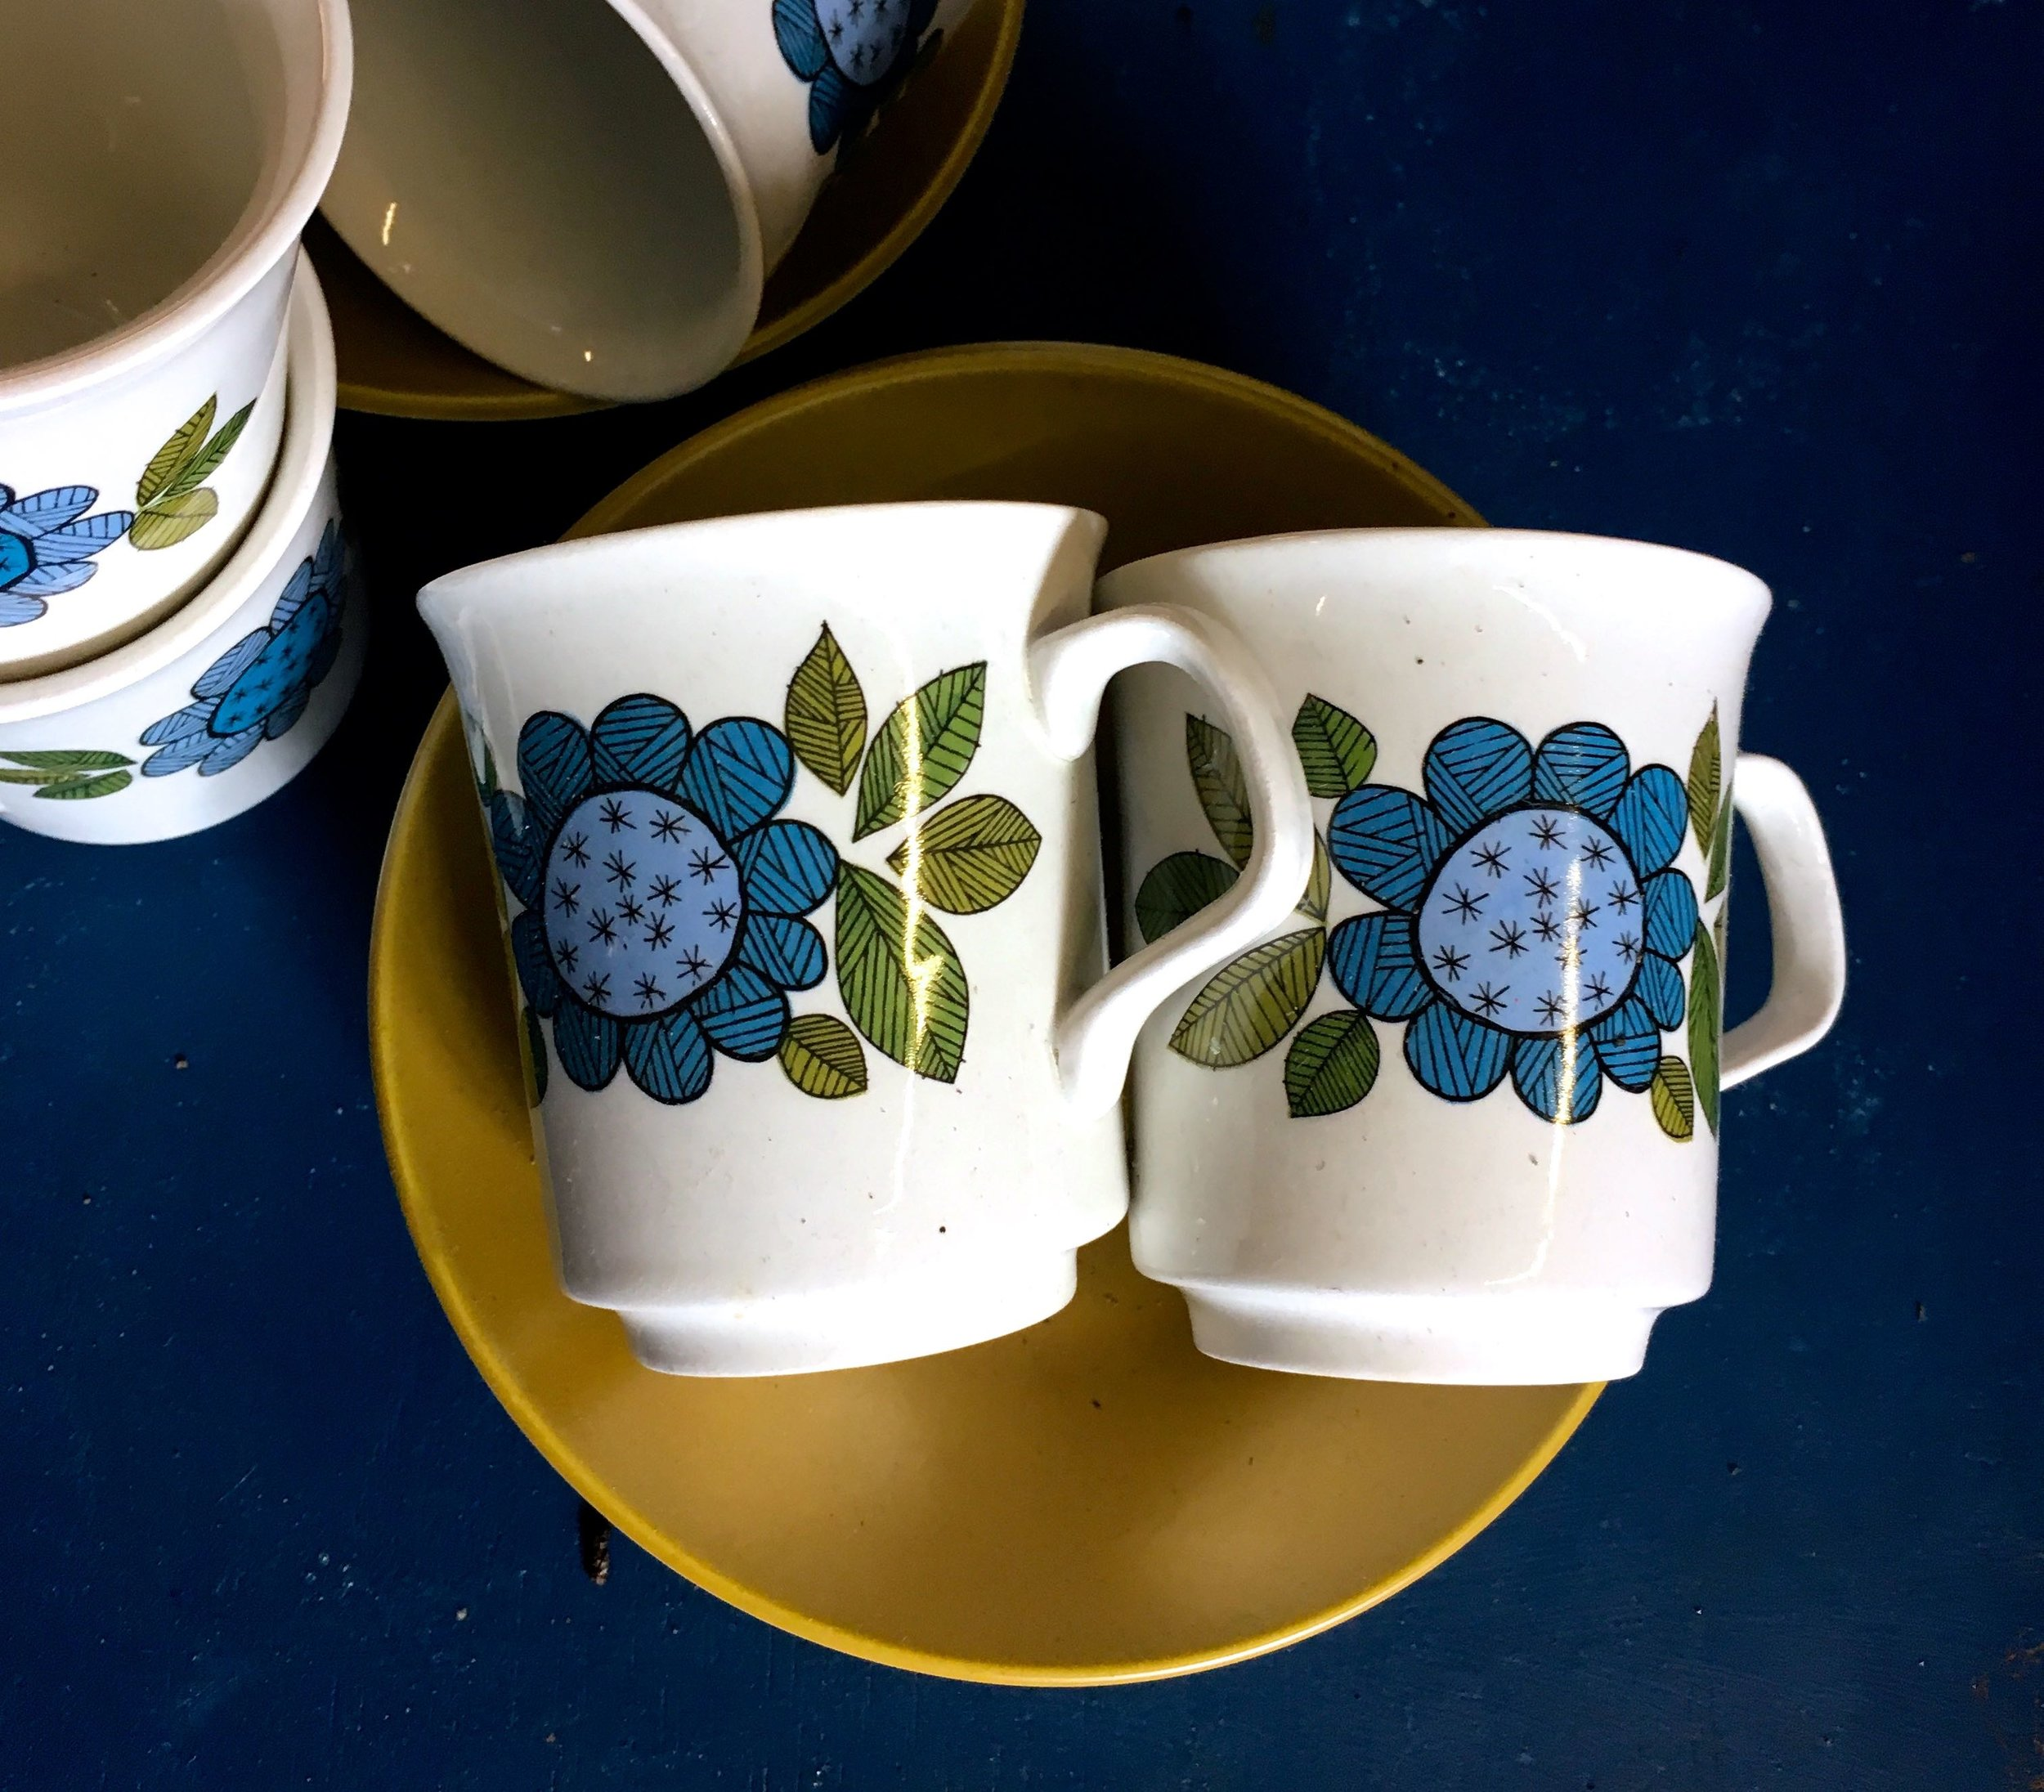 A bold patterned coffee set